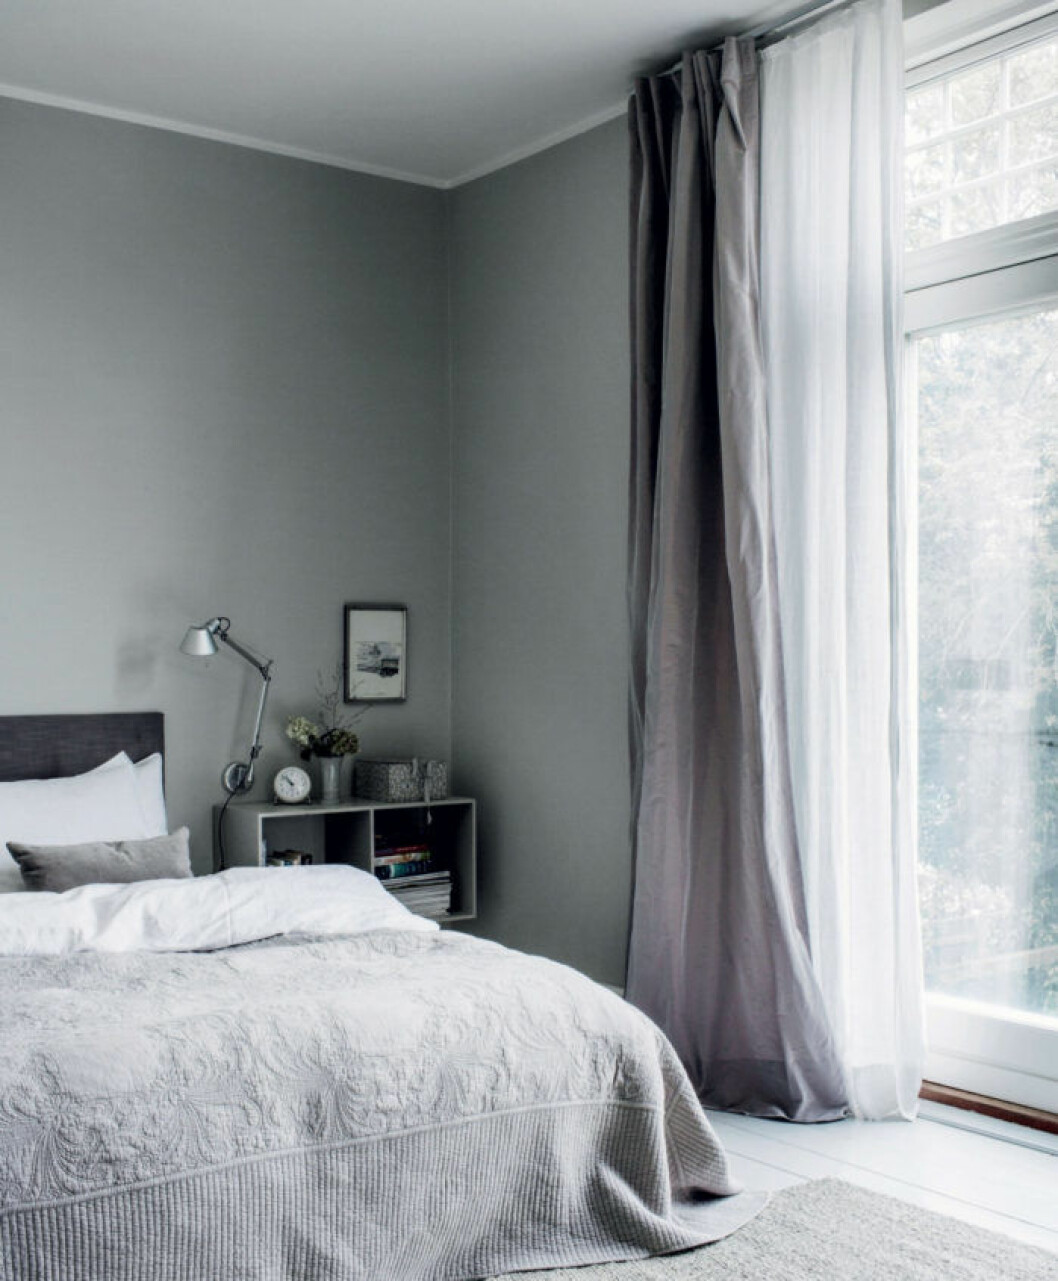 Sovrum med gardiner som har fint fall